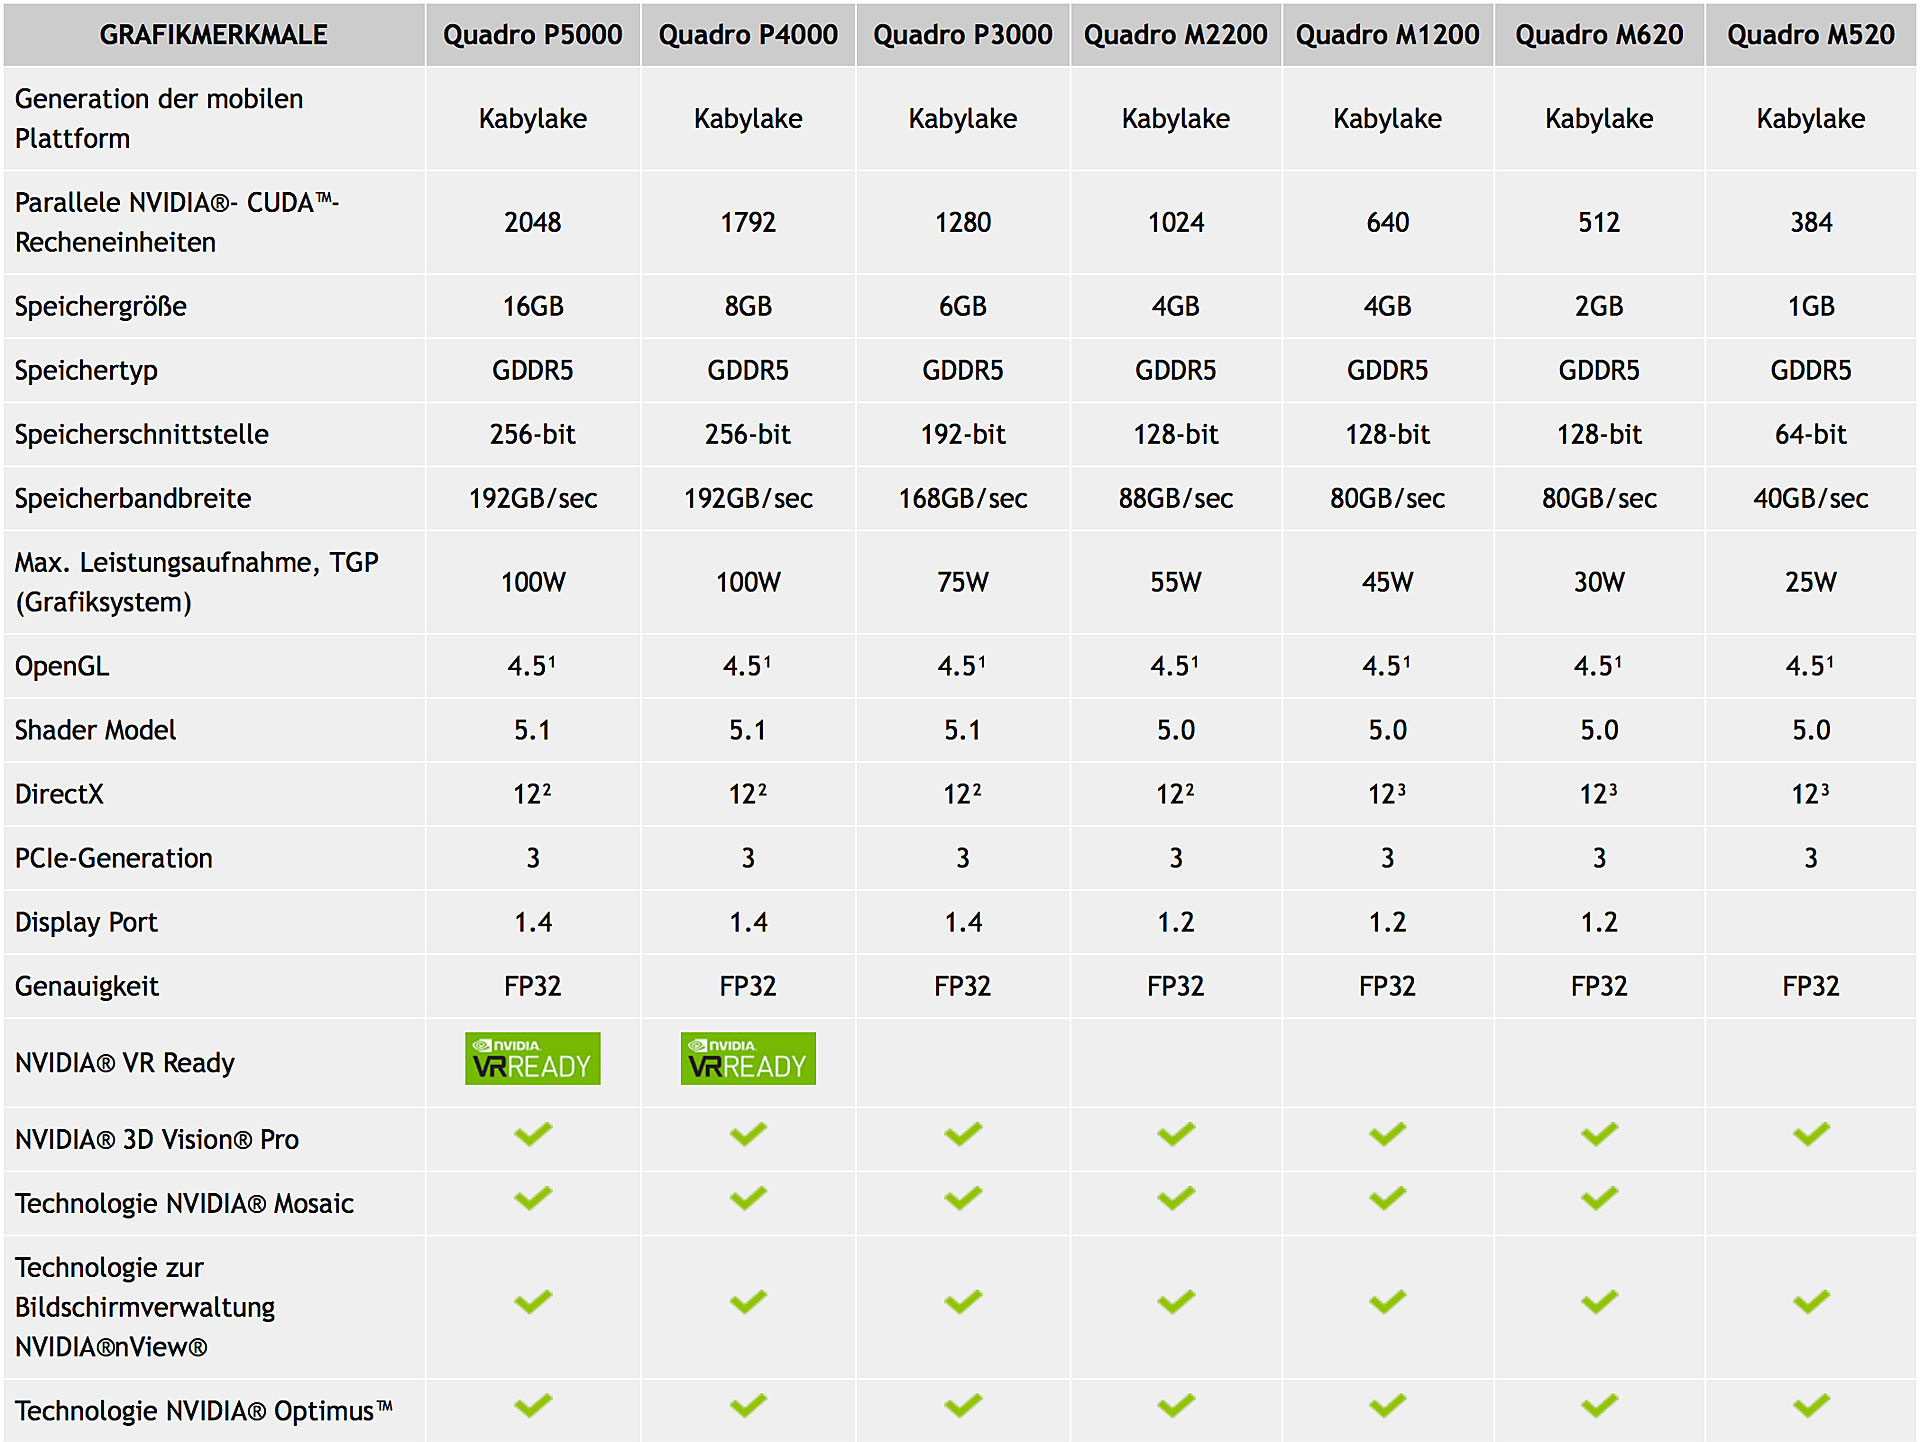 Bild Nvidia: Nvidia Quadro M1200